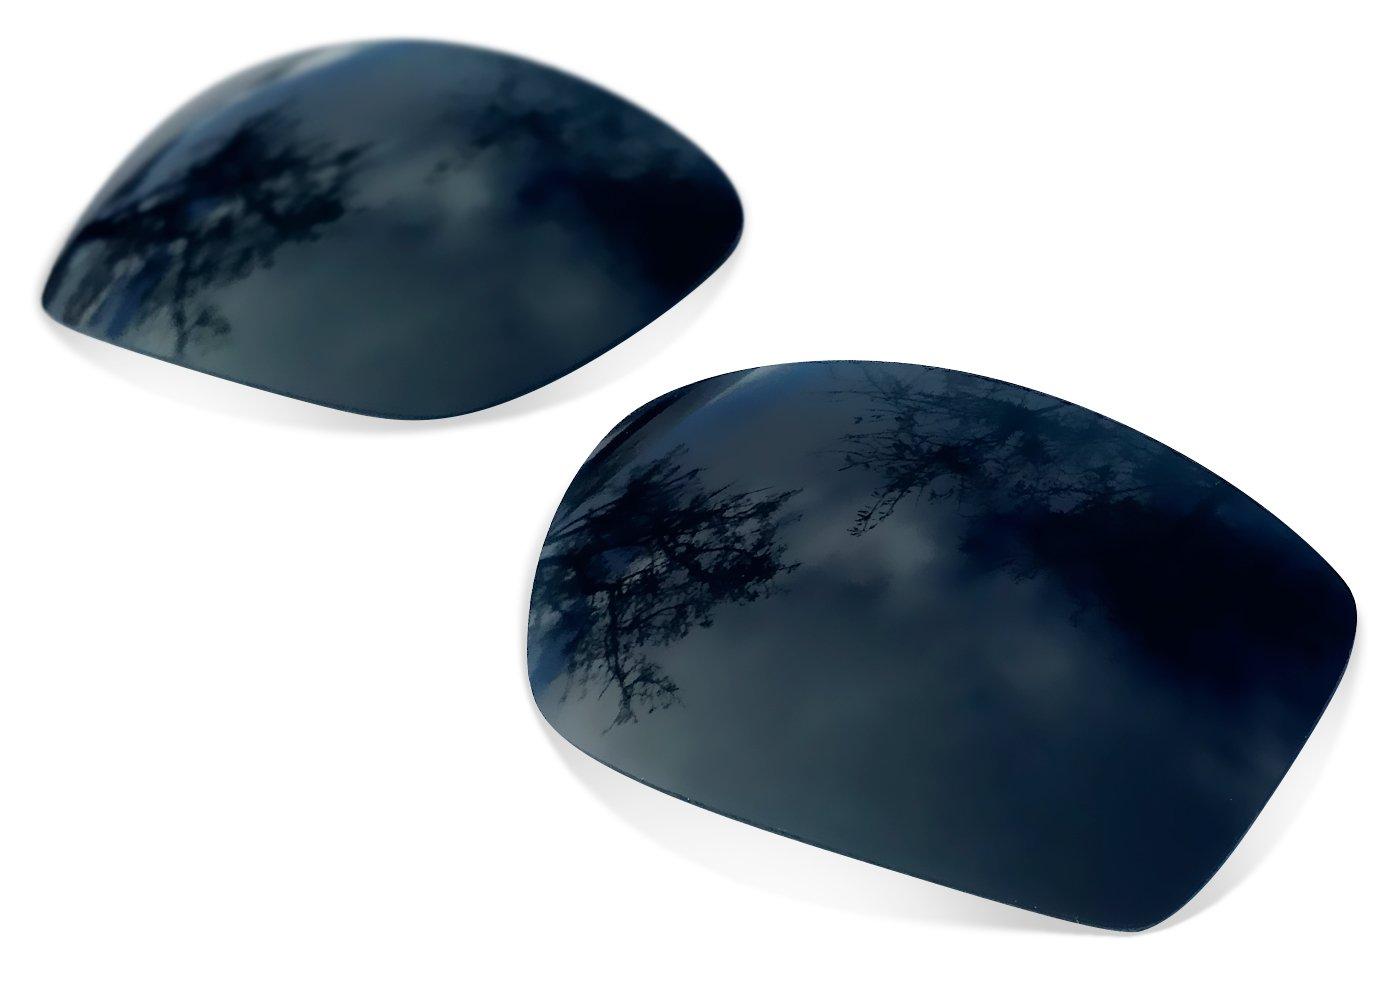 Sunglasses Restorer Lentes Polarizadas de Recambio Black Iridium para Oakley Eyepatch 2